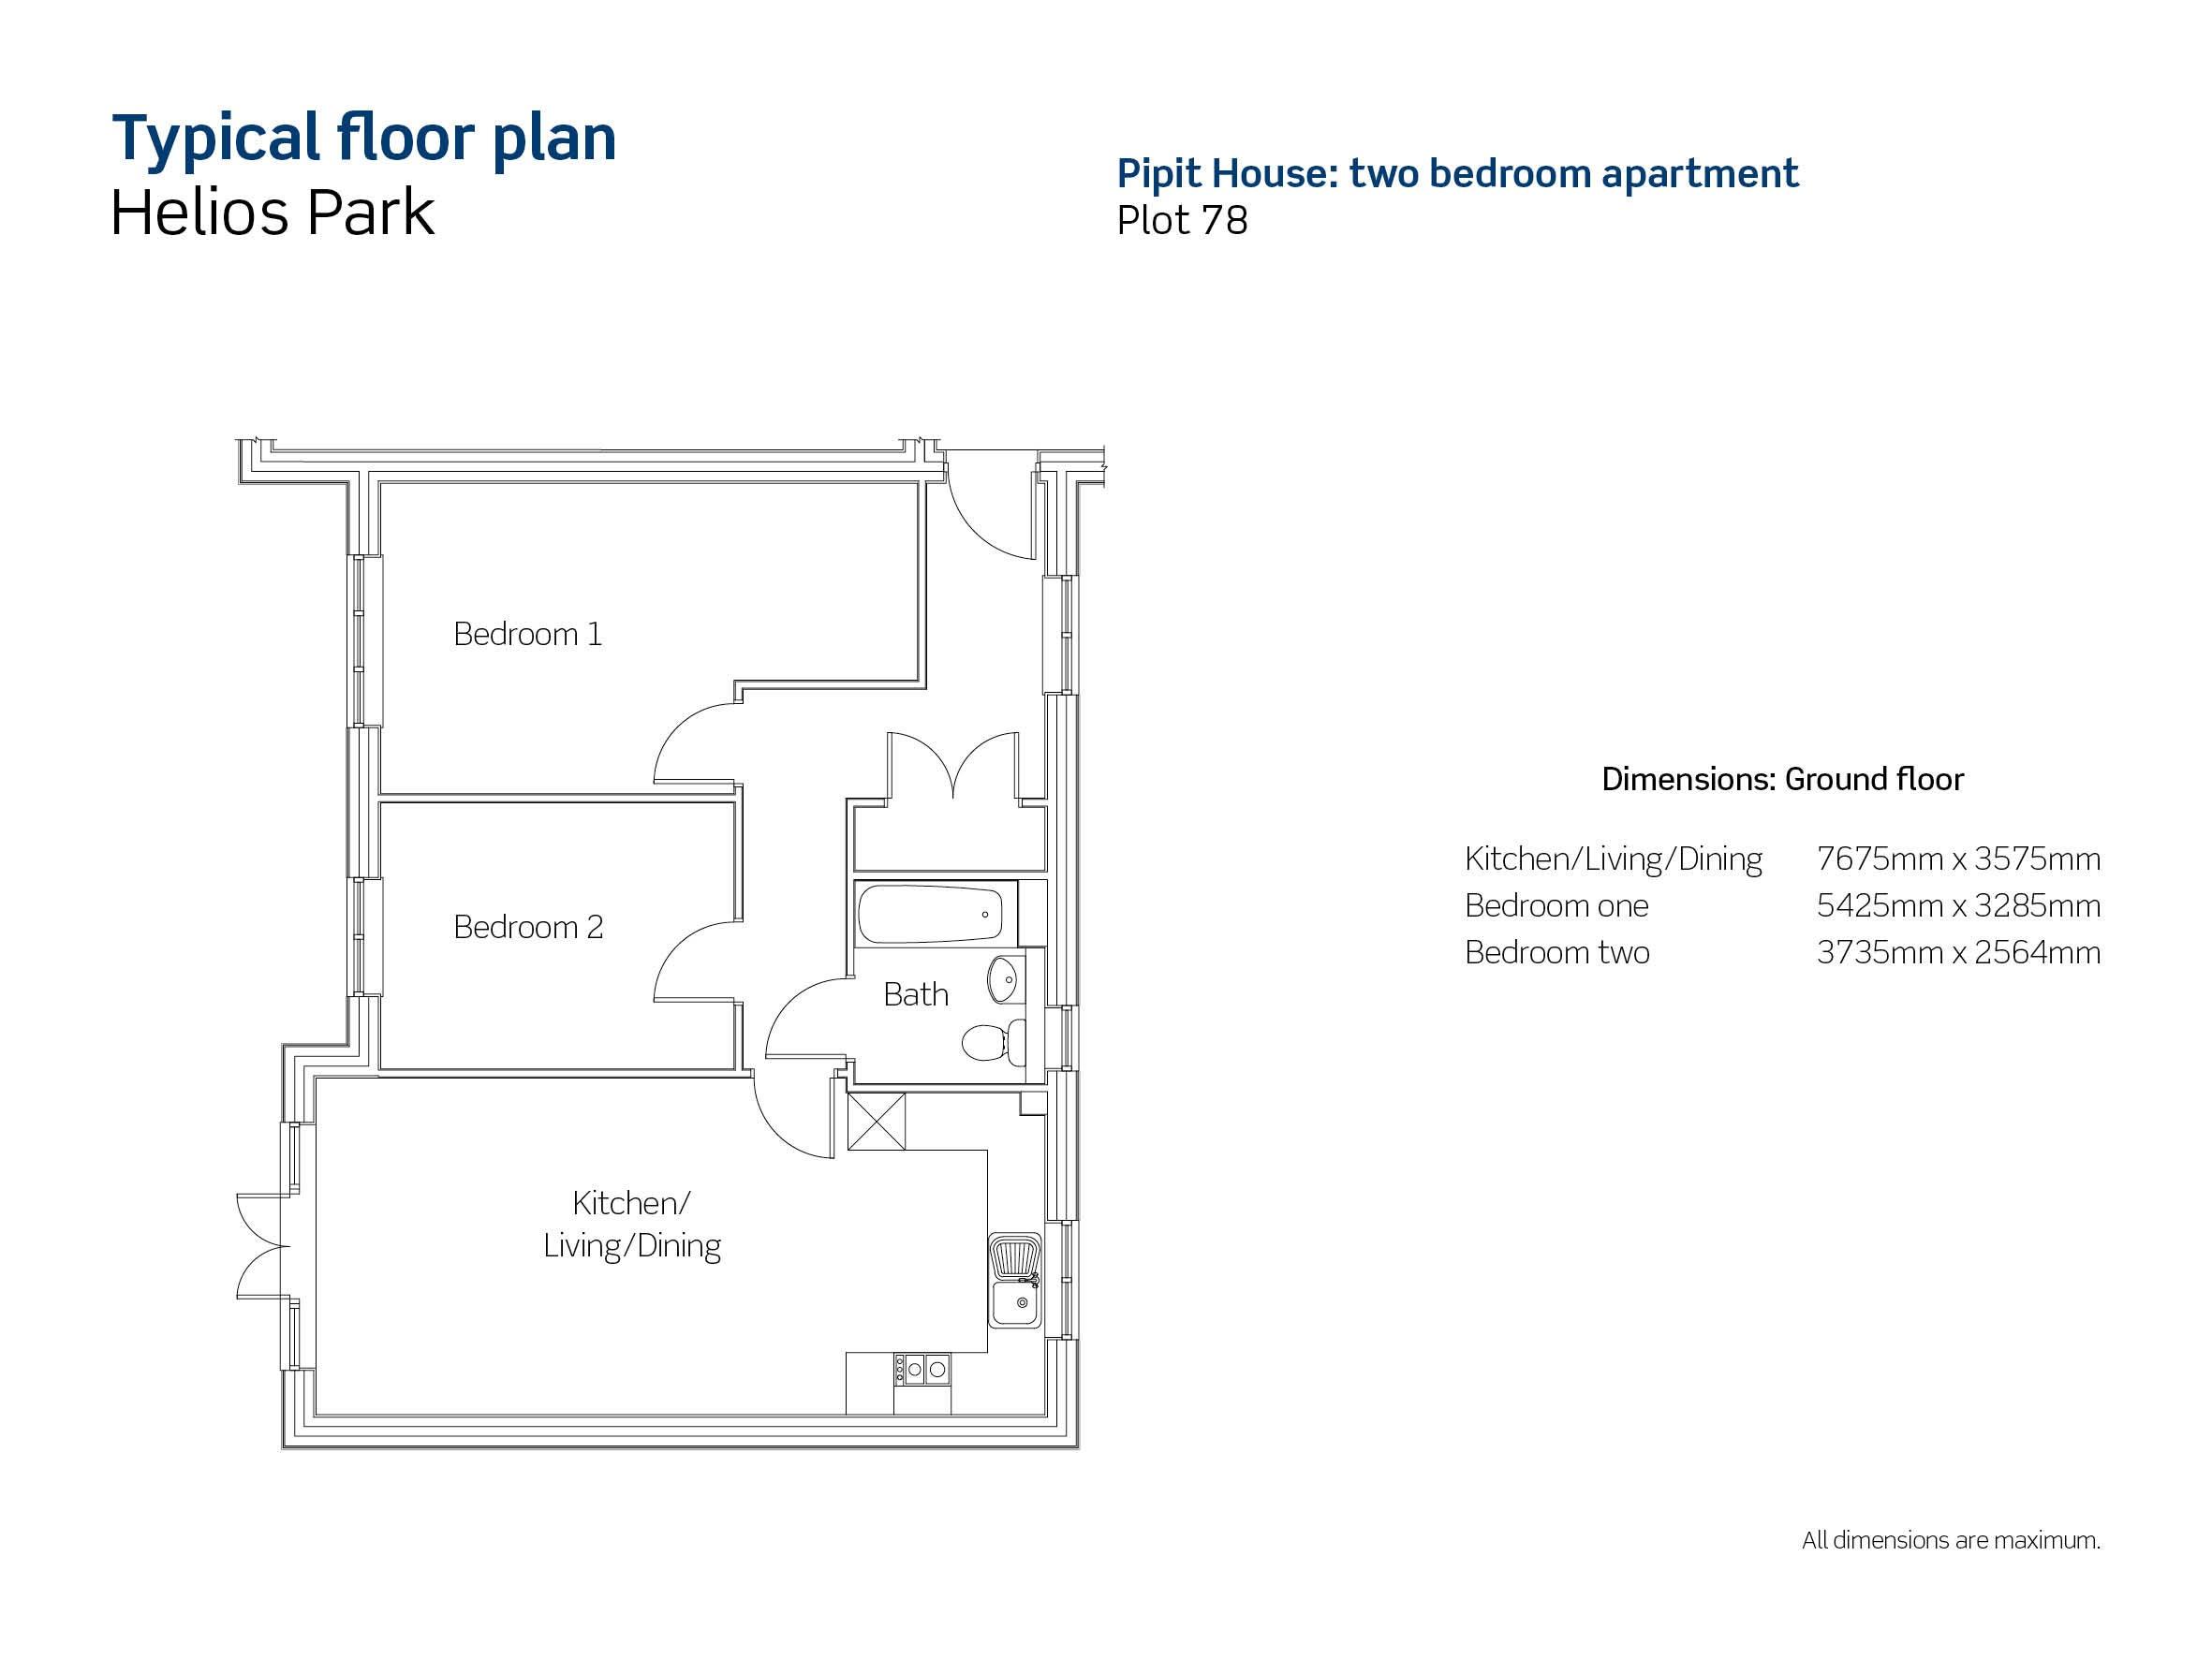 Helios Park plot 78 floor plan